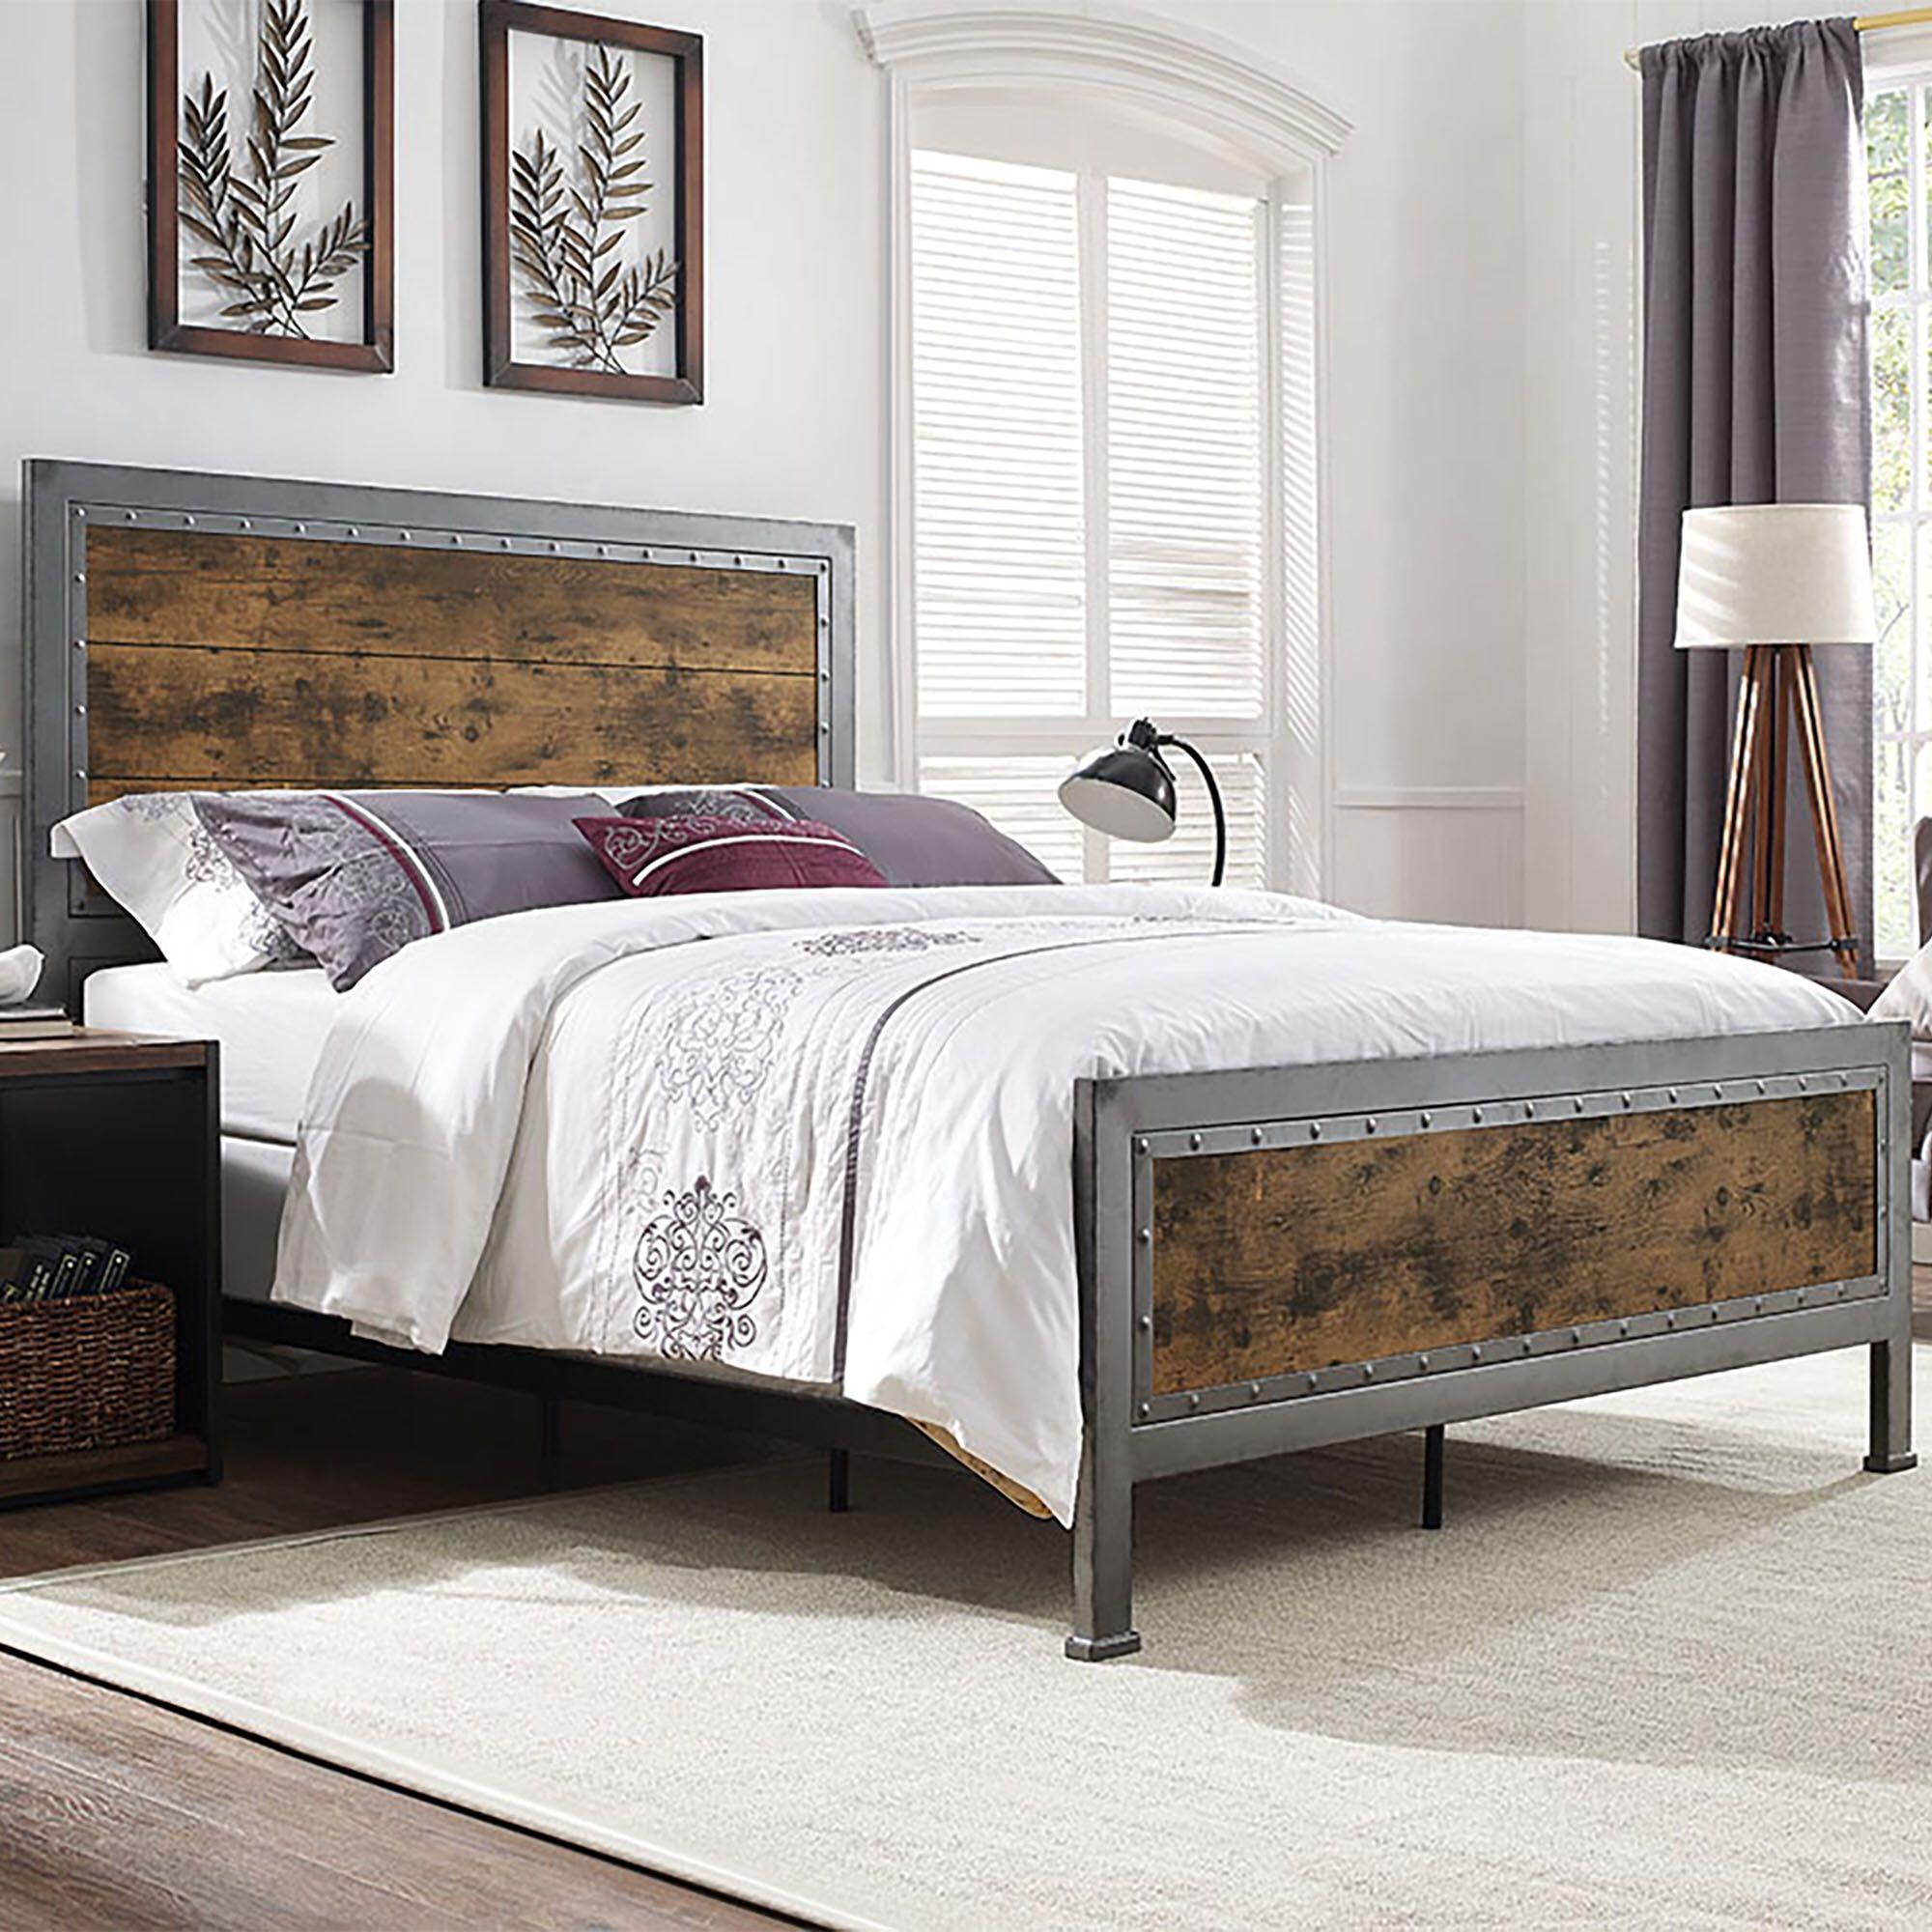 Best Berta Queen Standard Bed Bed Frame Headboard Furniture 640 x 480